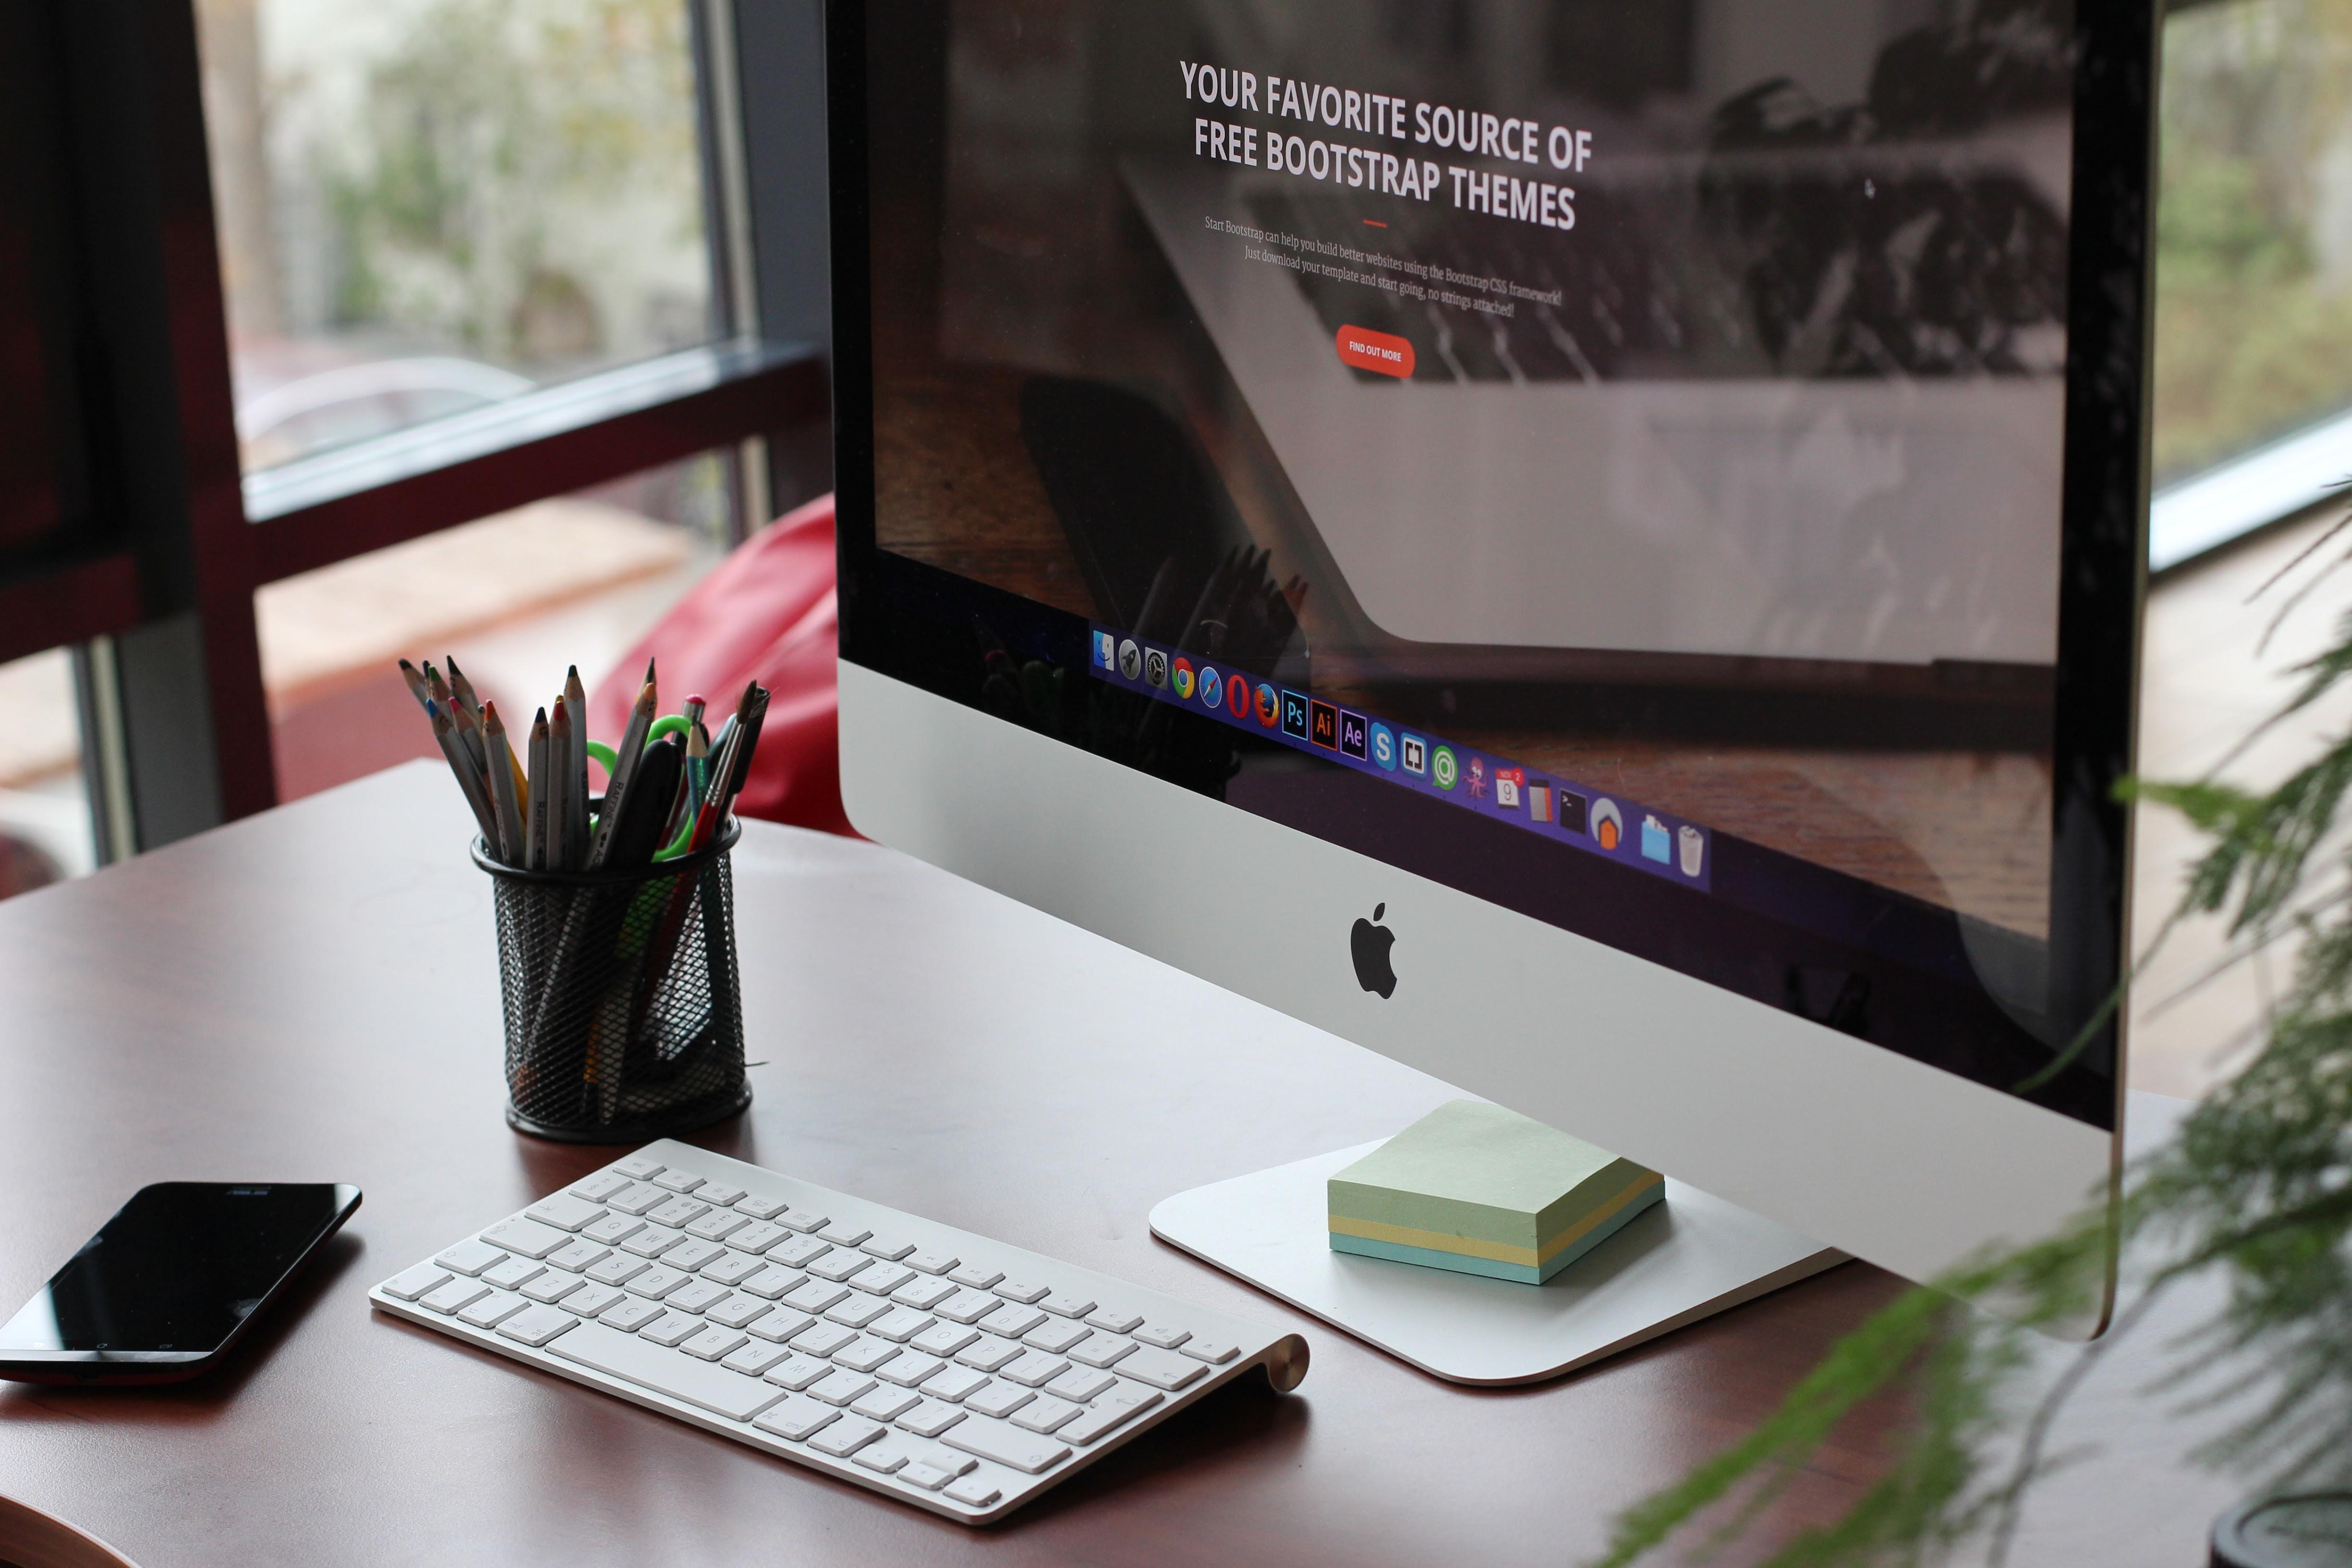 Desk Computer Screen Le Keyboard Technology Worke Office Gadget Organized Furniture Work E Brand Imac Design